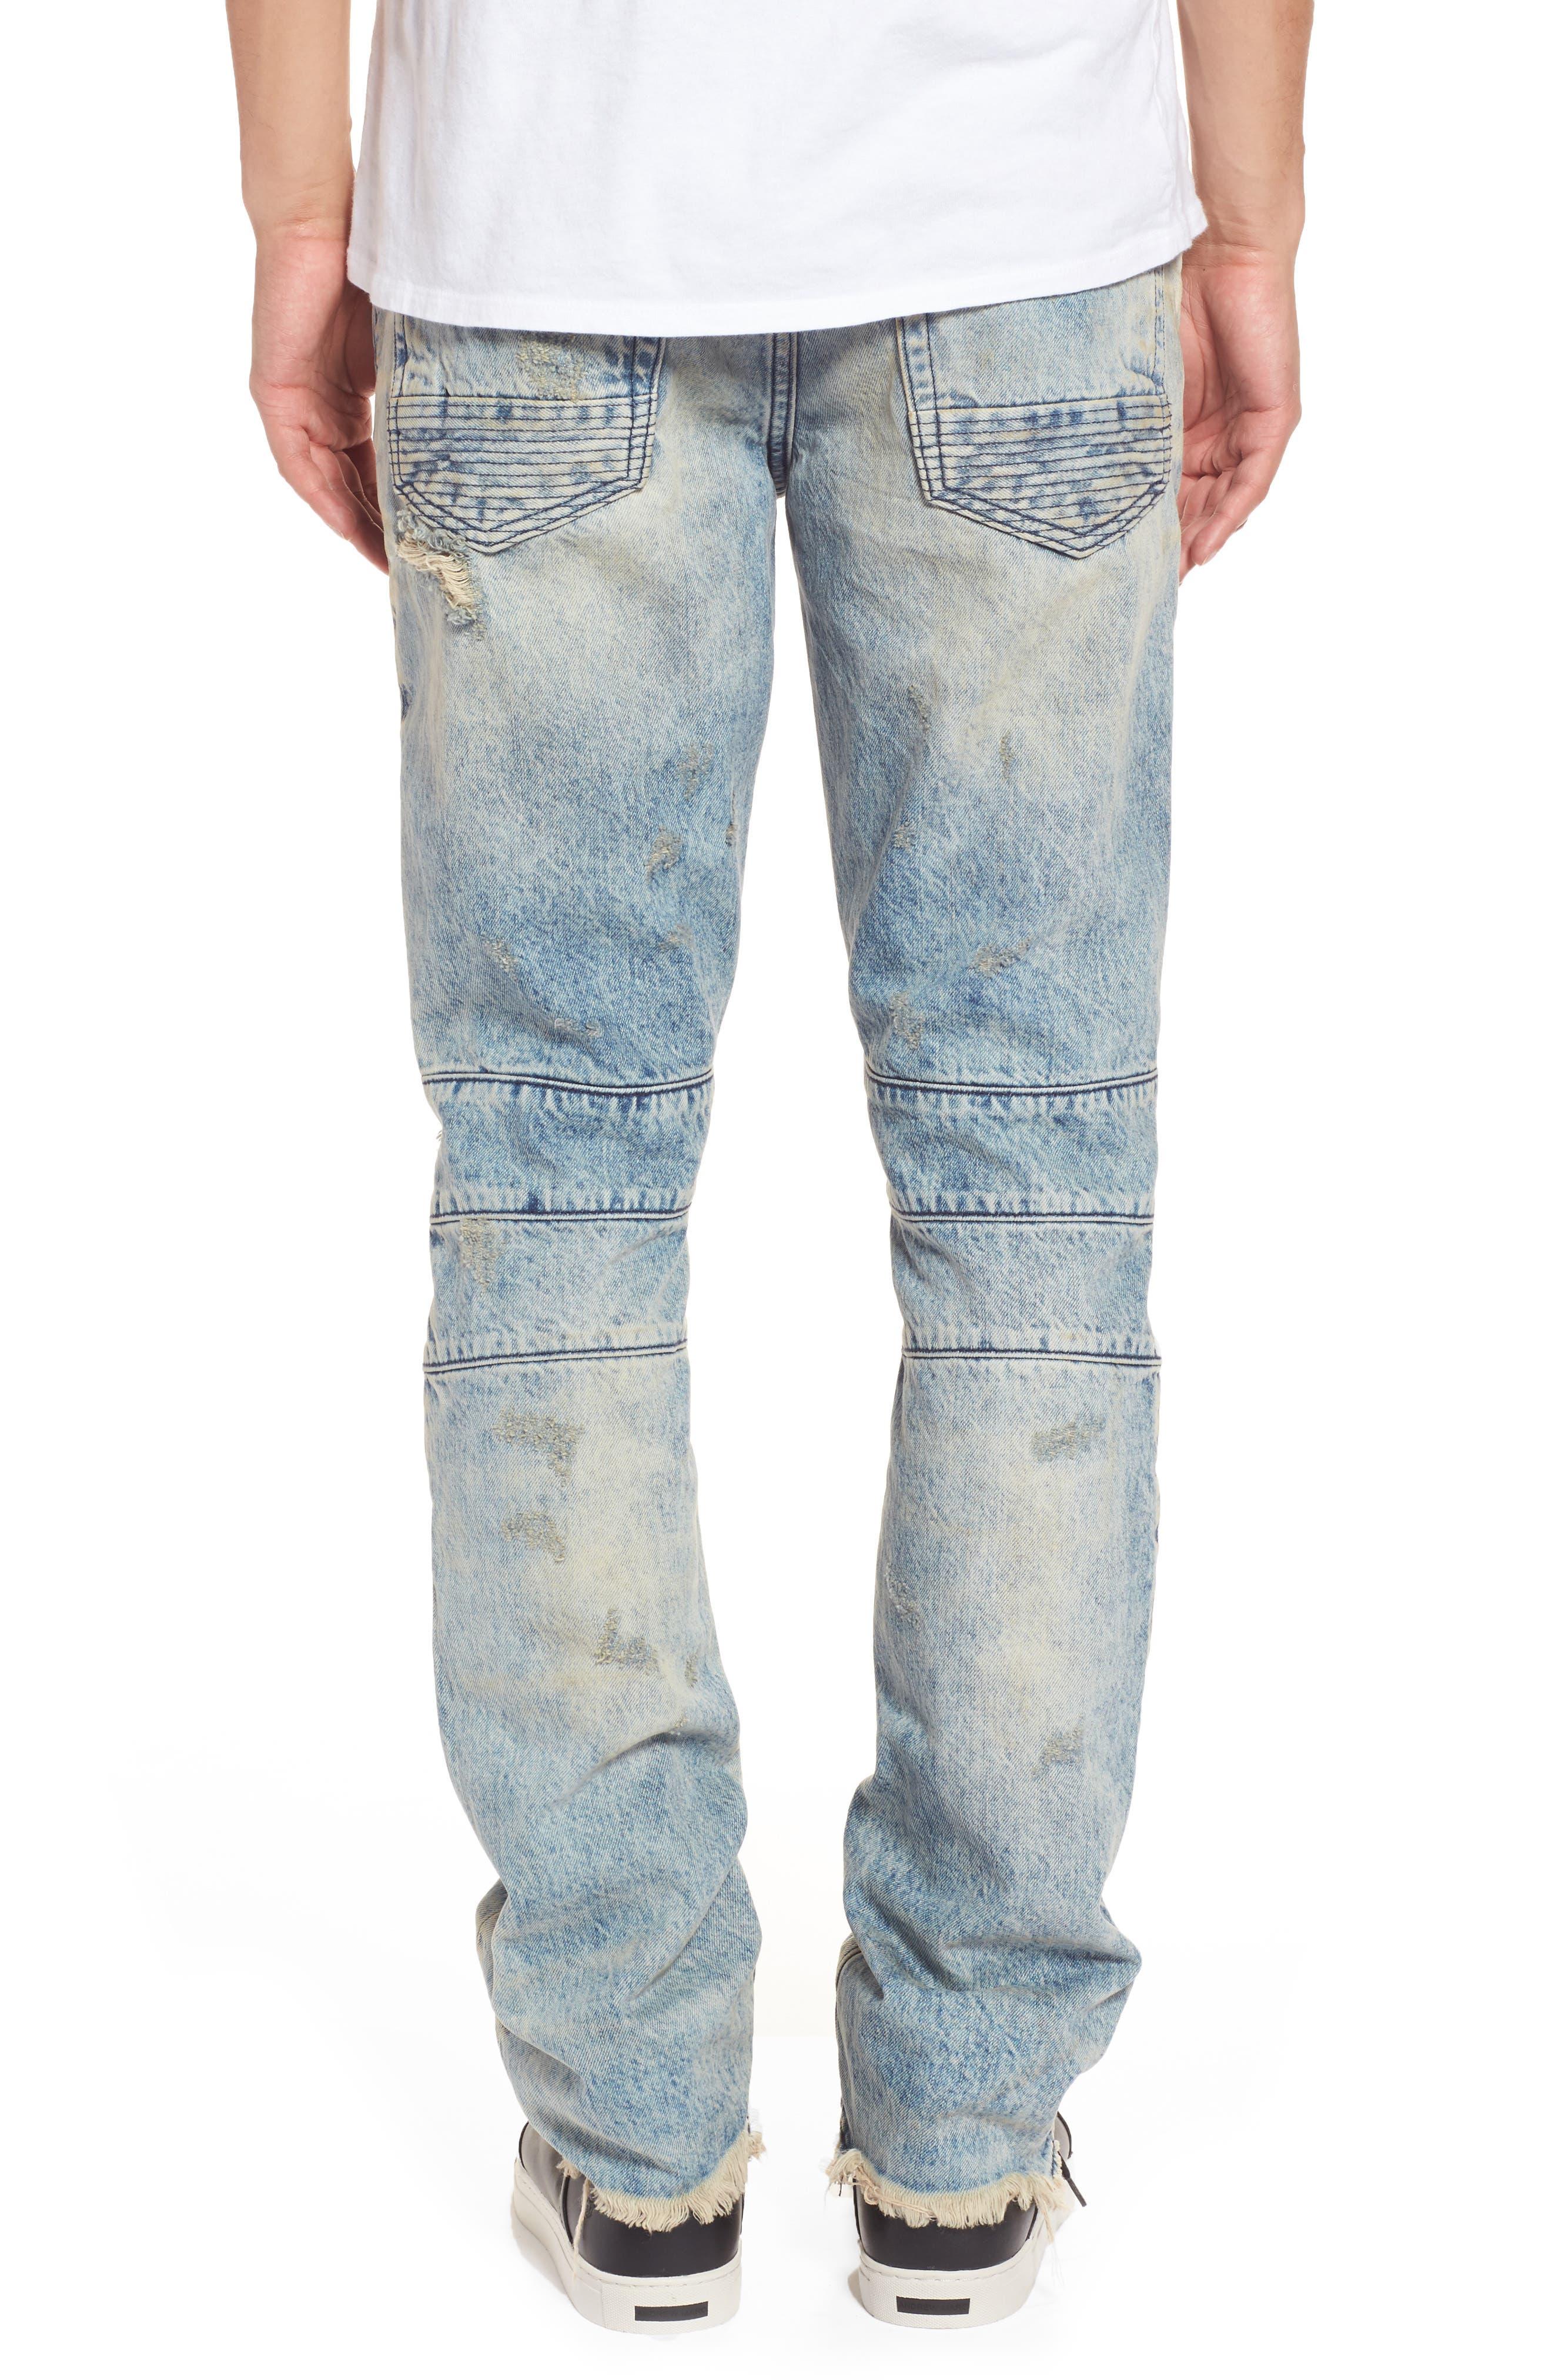 Le Sabre Slim Fit Moto Jeans,                             Alternate thumbnail 2, color,                             Harvested Light Wash